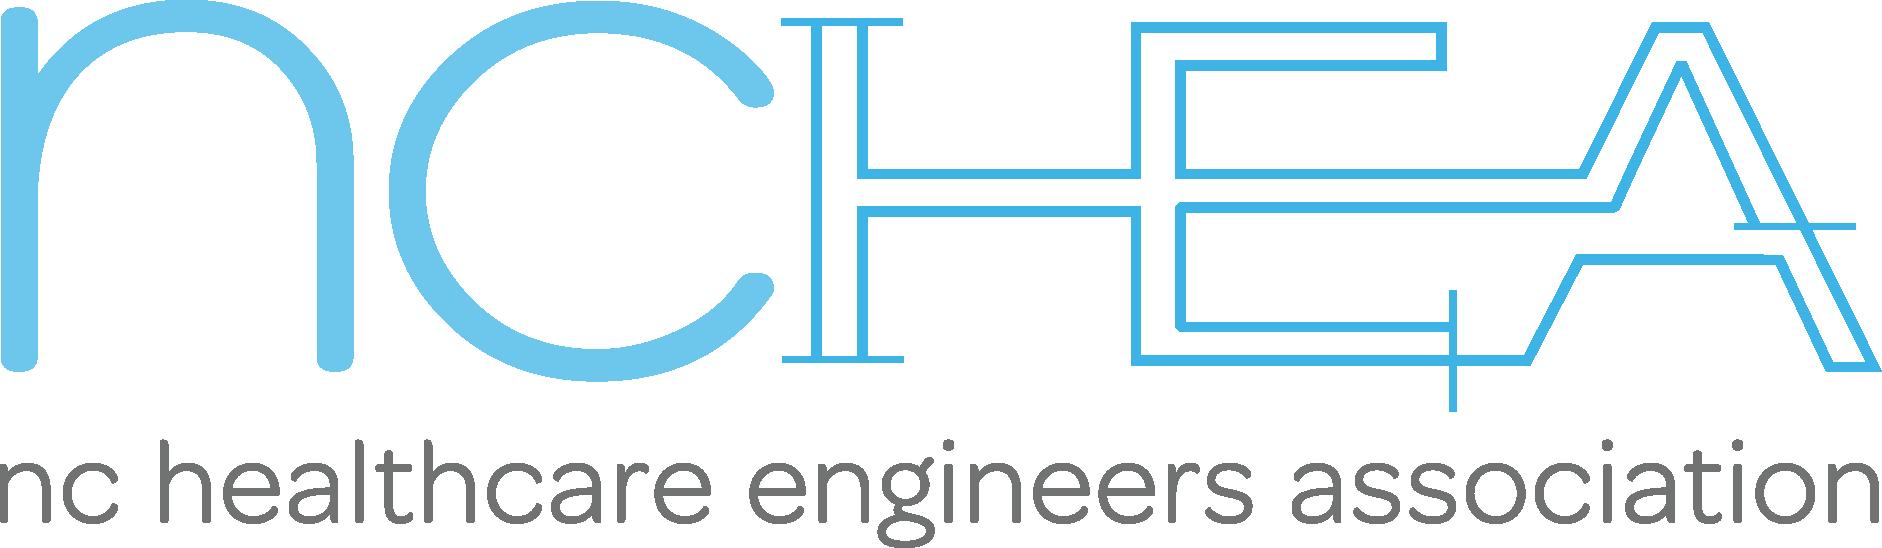 NCHEA_logo_RGB